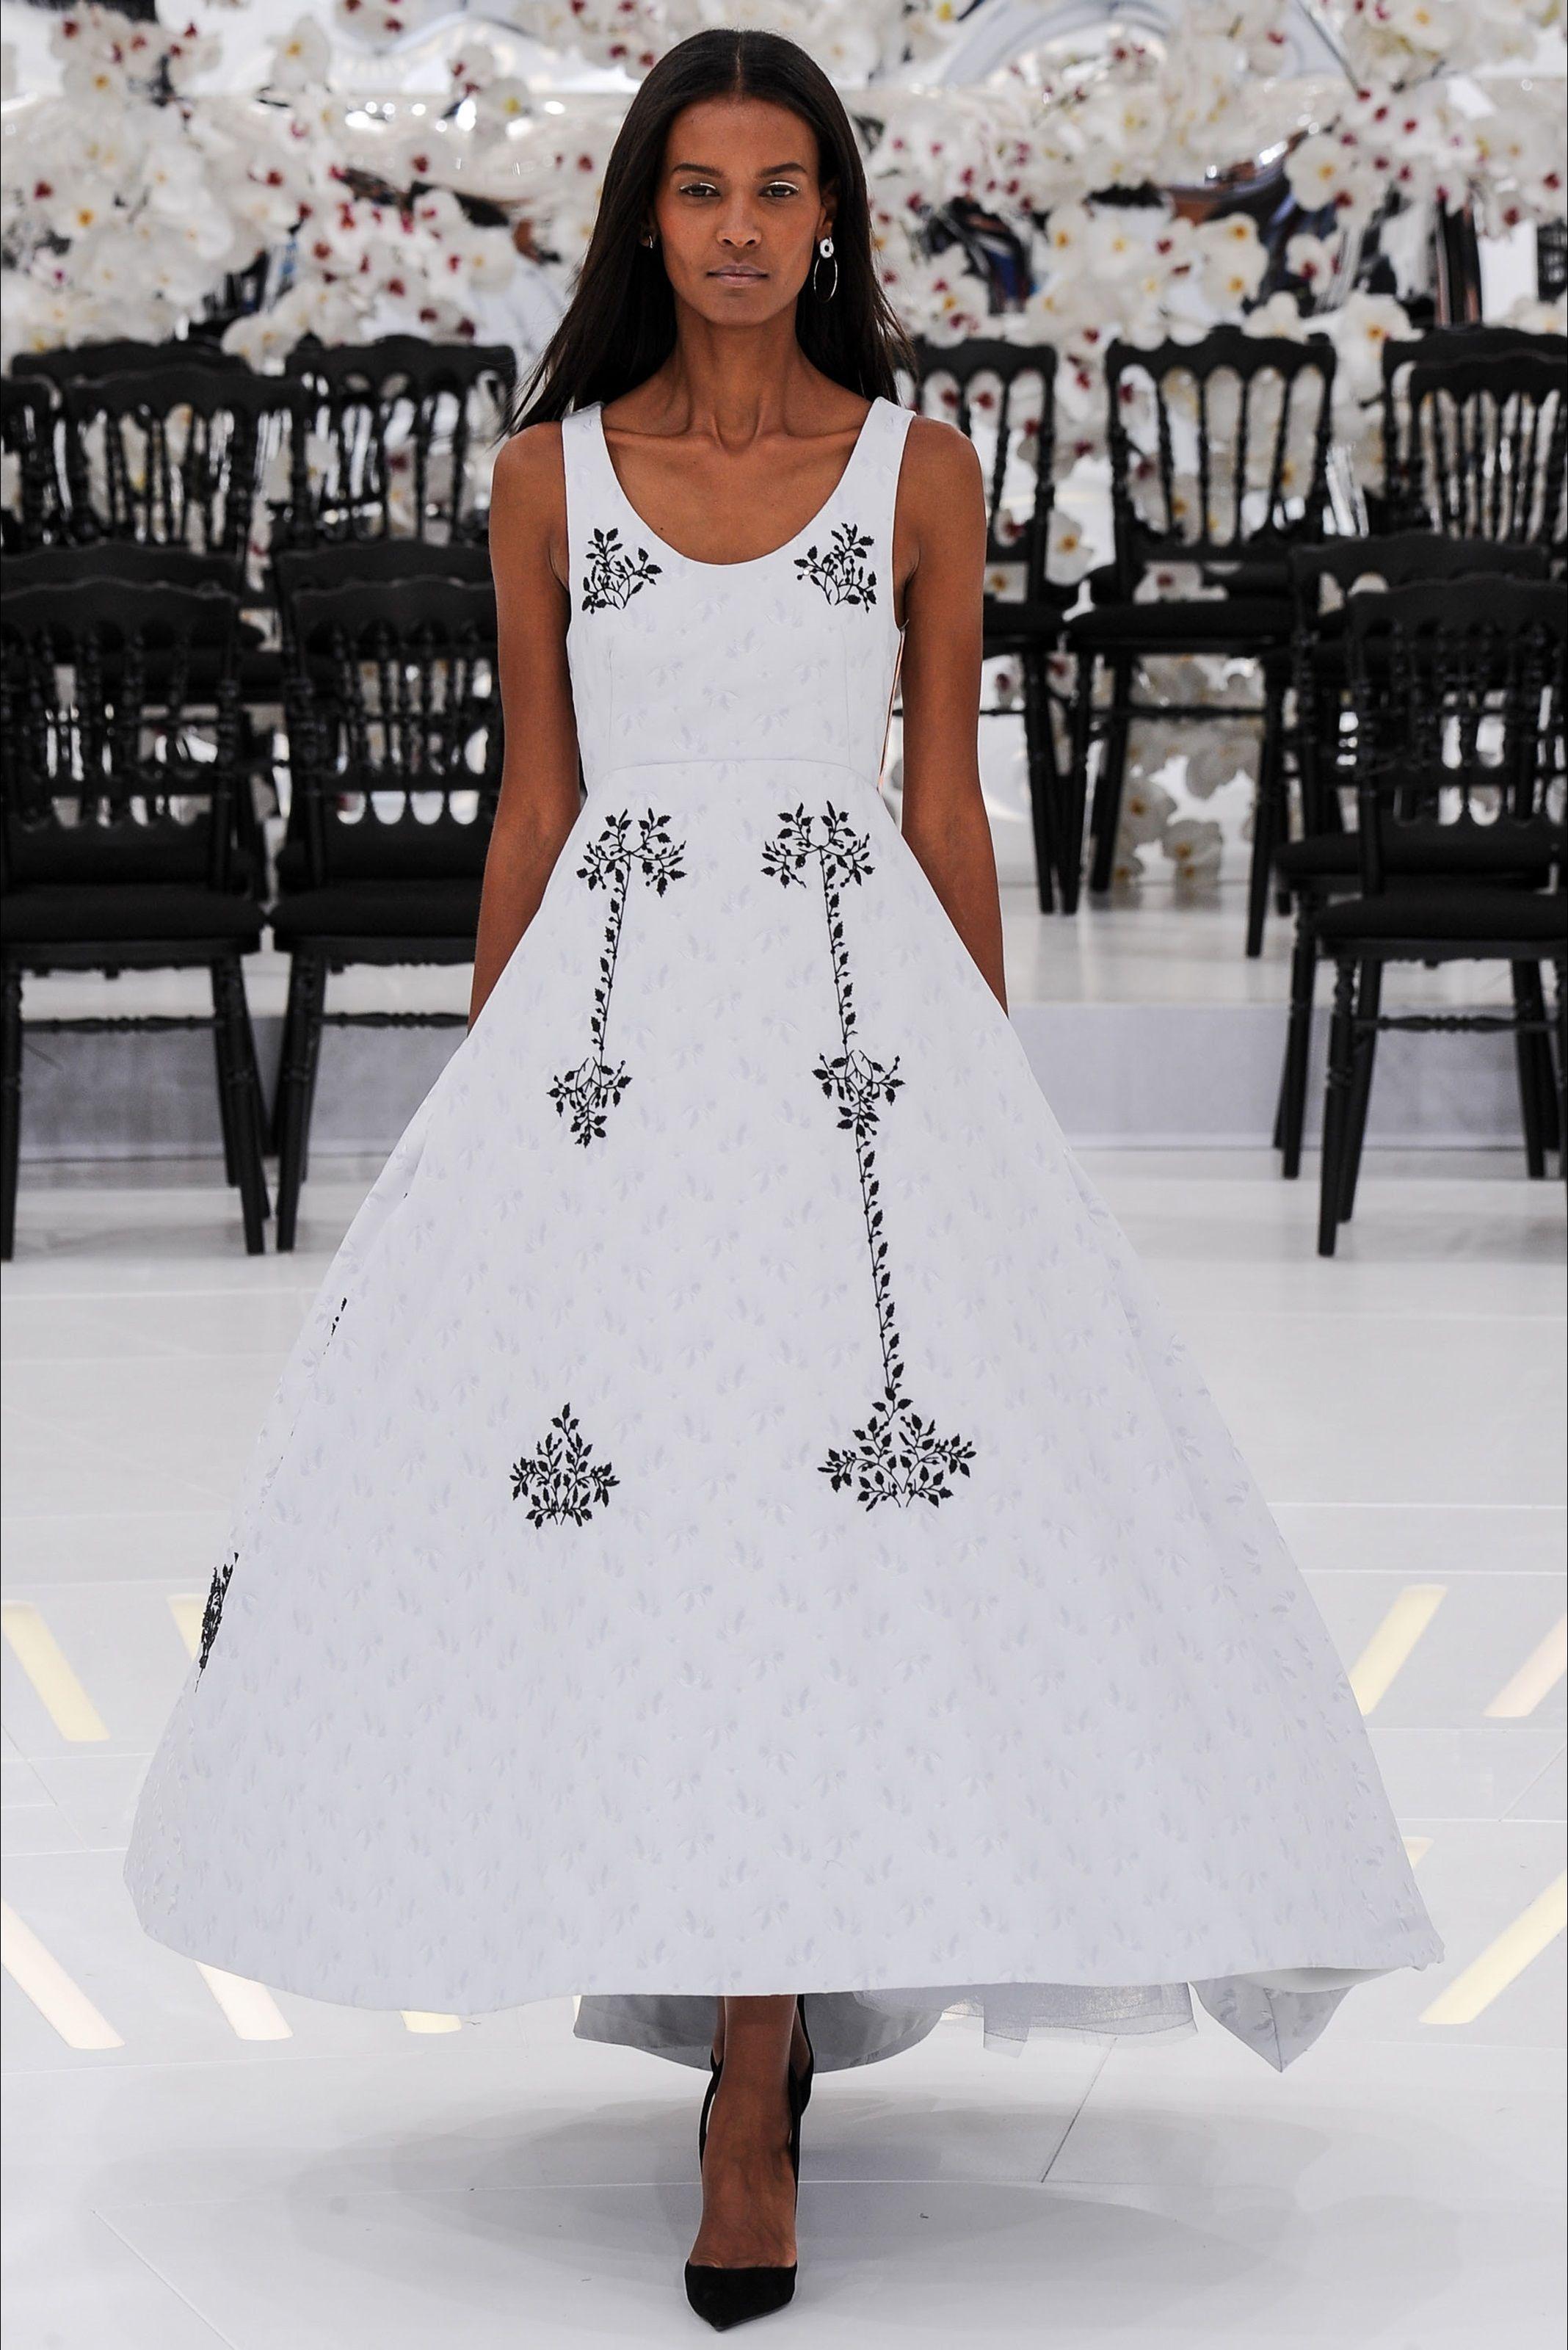 f20c8fce49283d Christian Dior Haute Couture Fall - Winter 2014/2015 | Couture ...